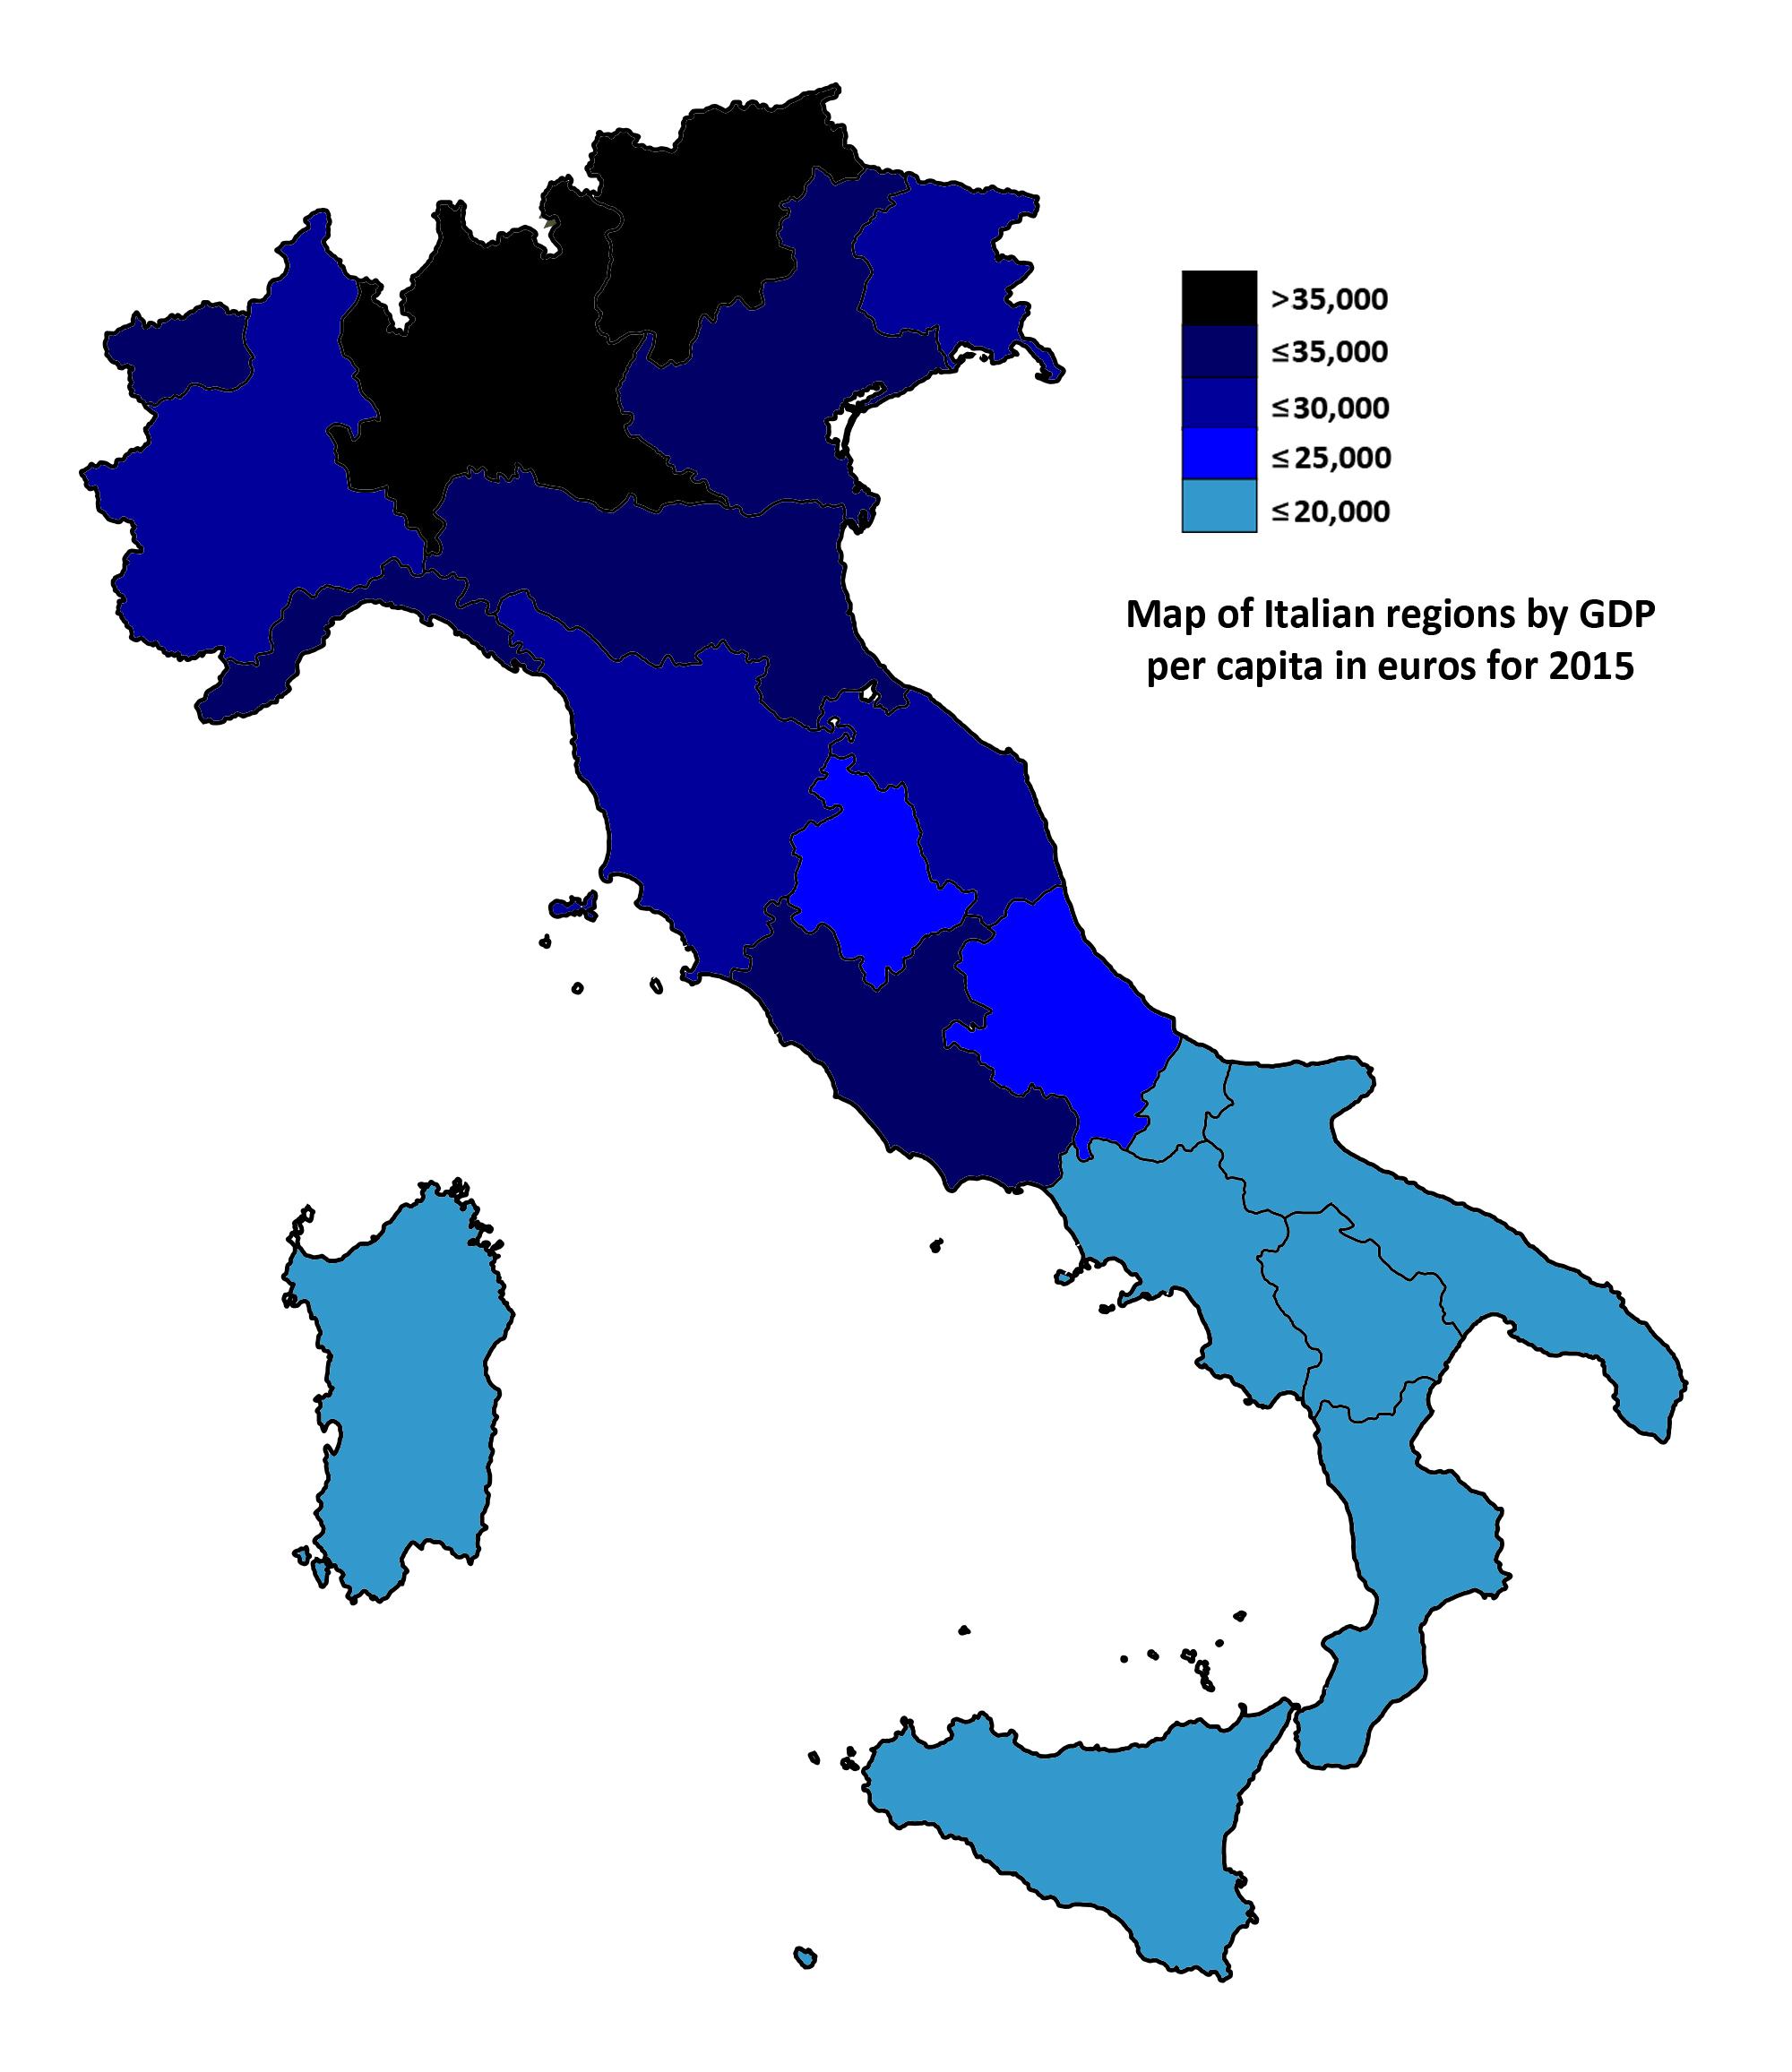 Map_of_Italian_regions_by_GDP_per_capita_in_euros_%282015%29.jpg